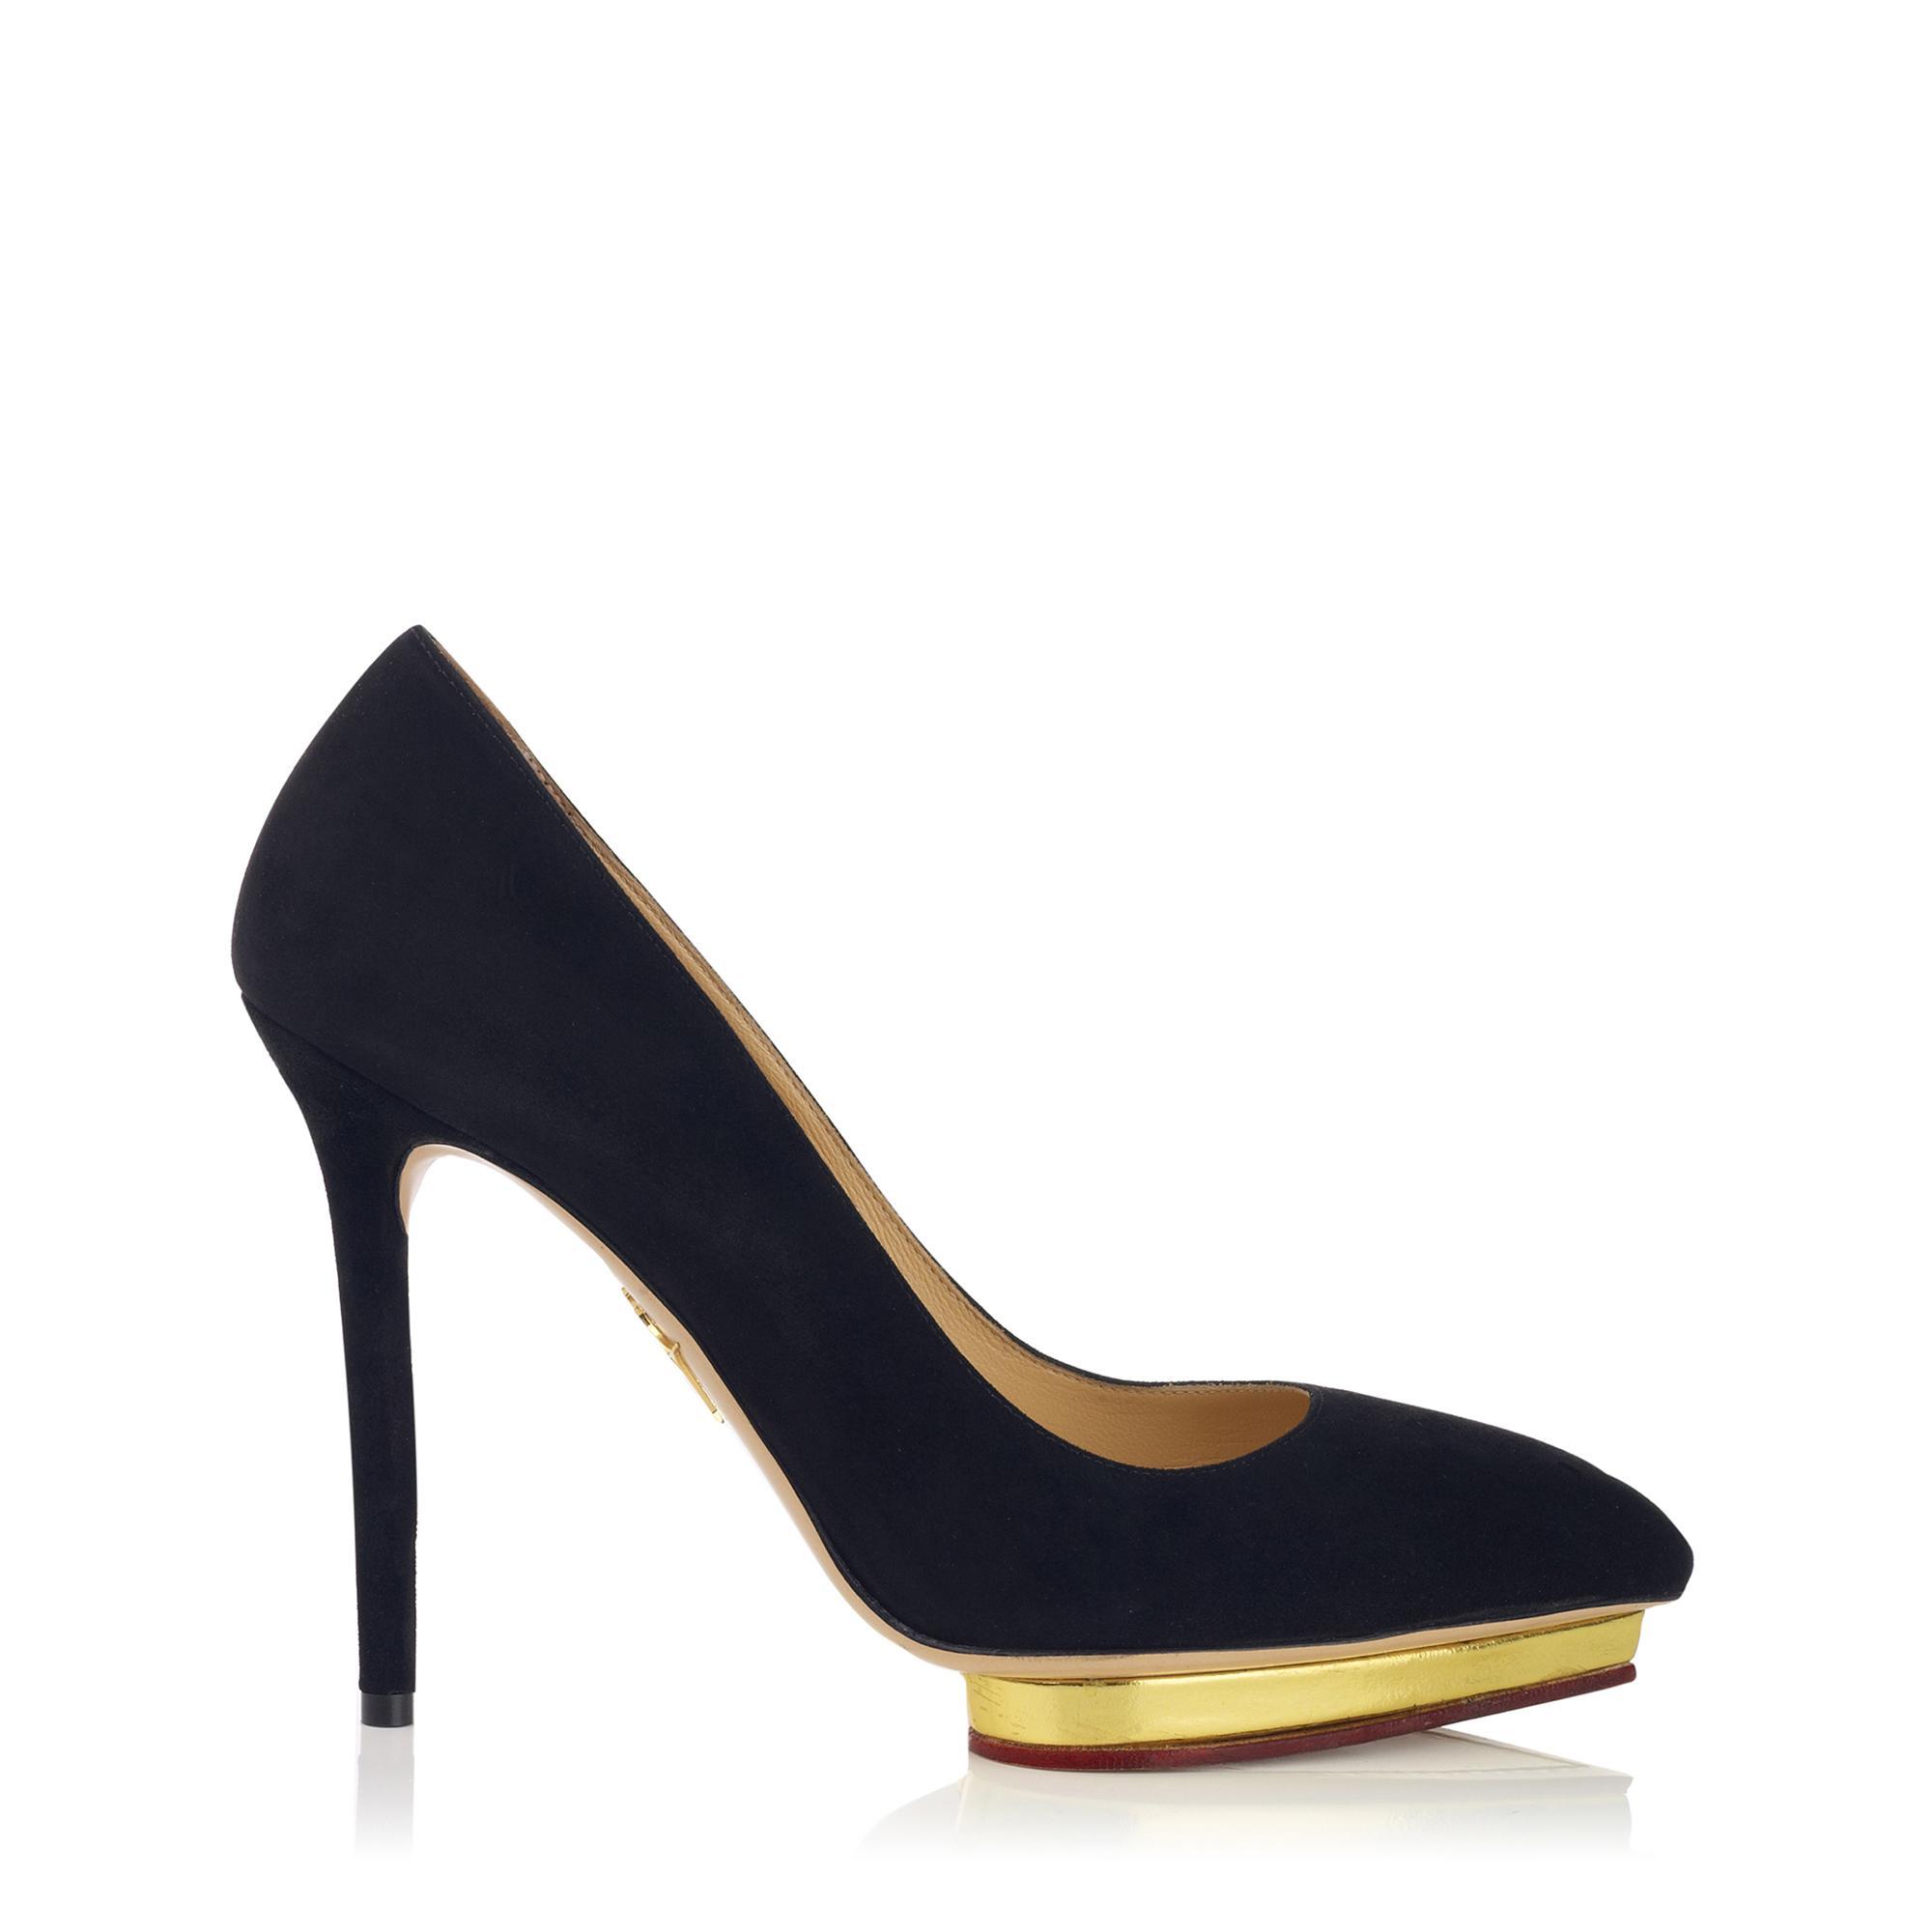 Debbie | Luxury Designer Shoes & Handbags | Charlotte Olympia